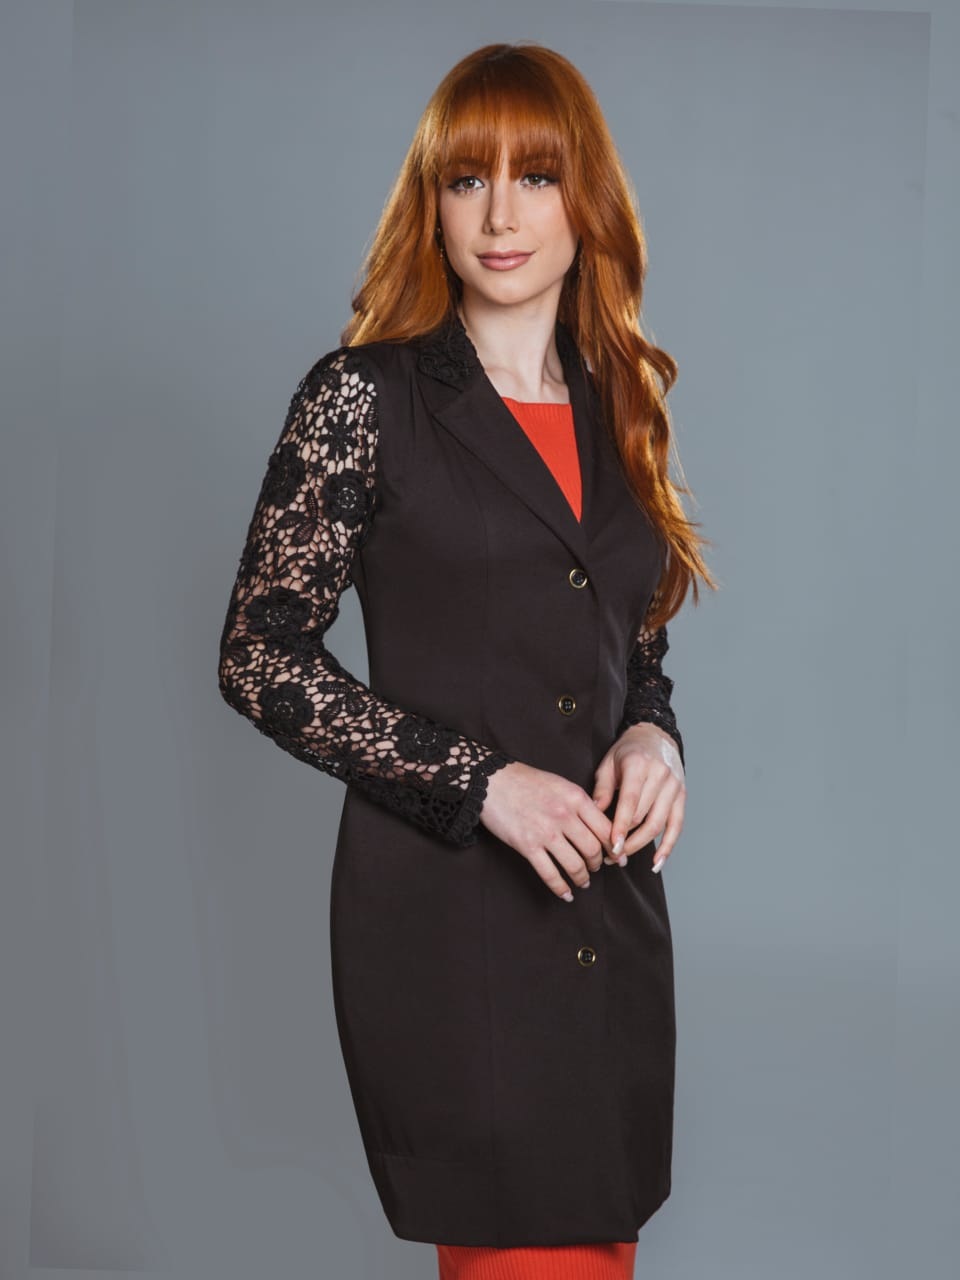 Jaleco Feminino com Renda  Ônix